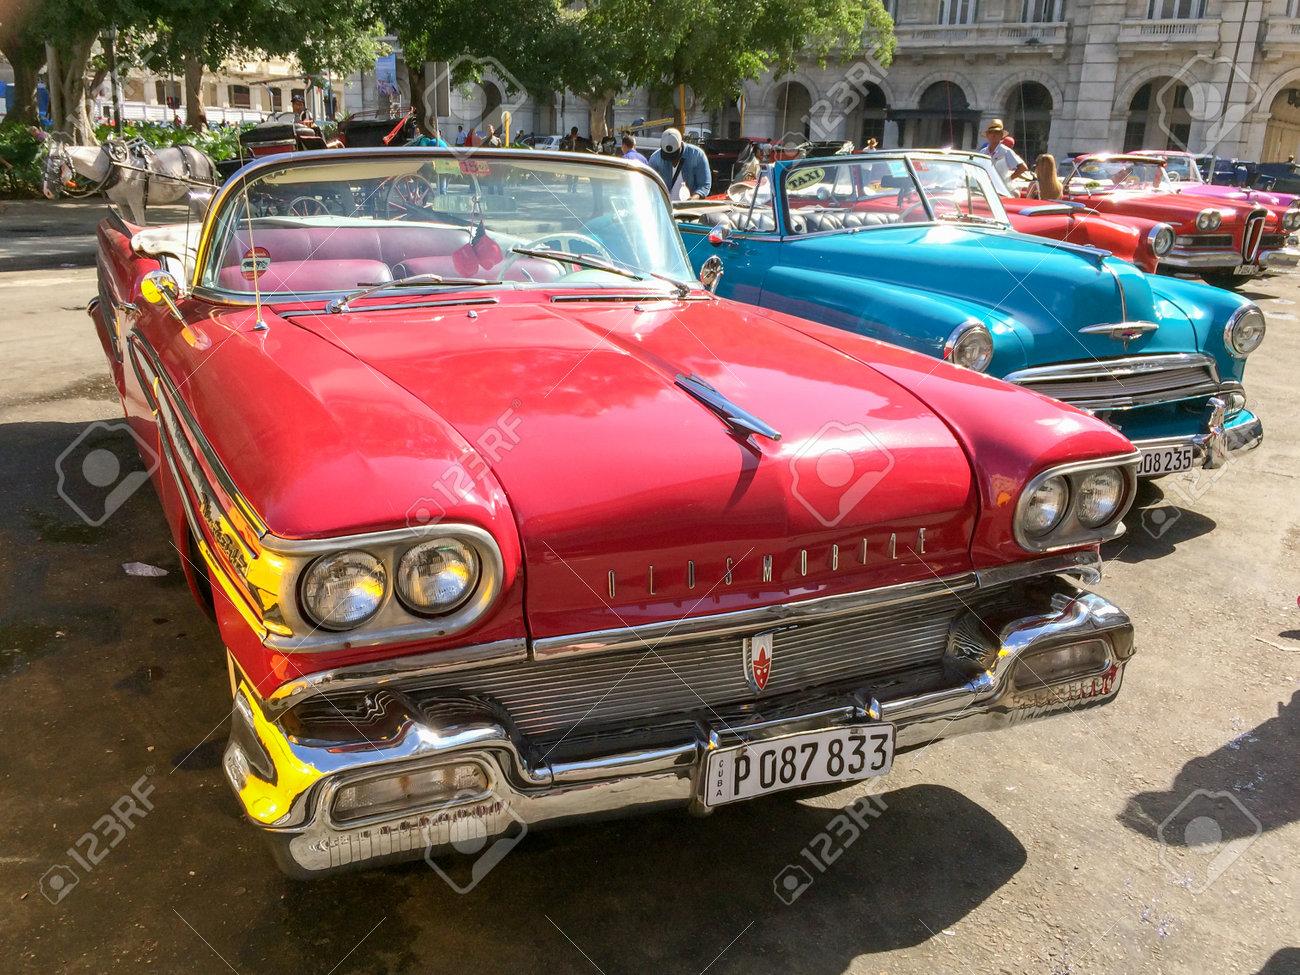 American Classic Cars >> Havana Cuba April 18 Vintage American Classic Cars Parked